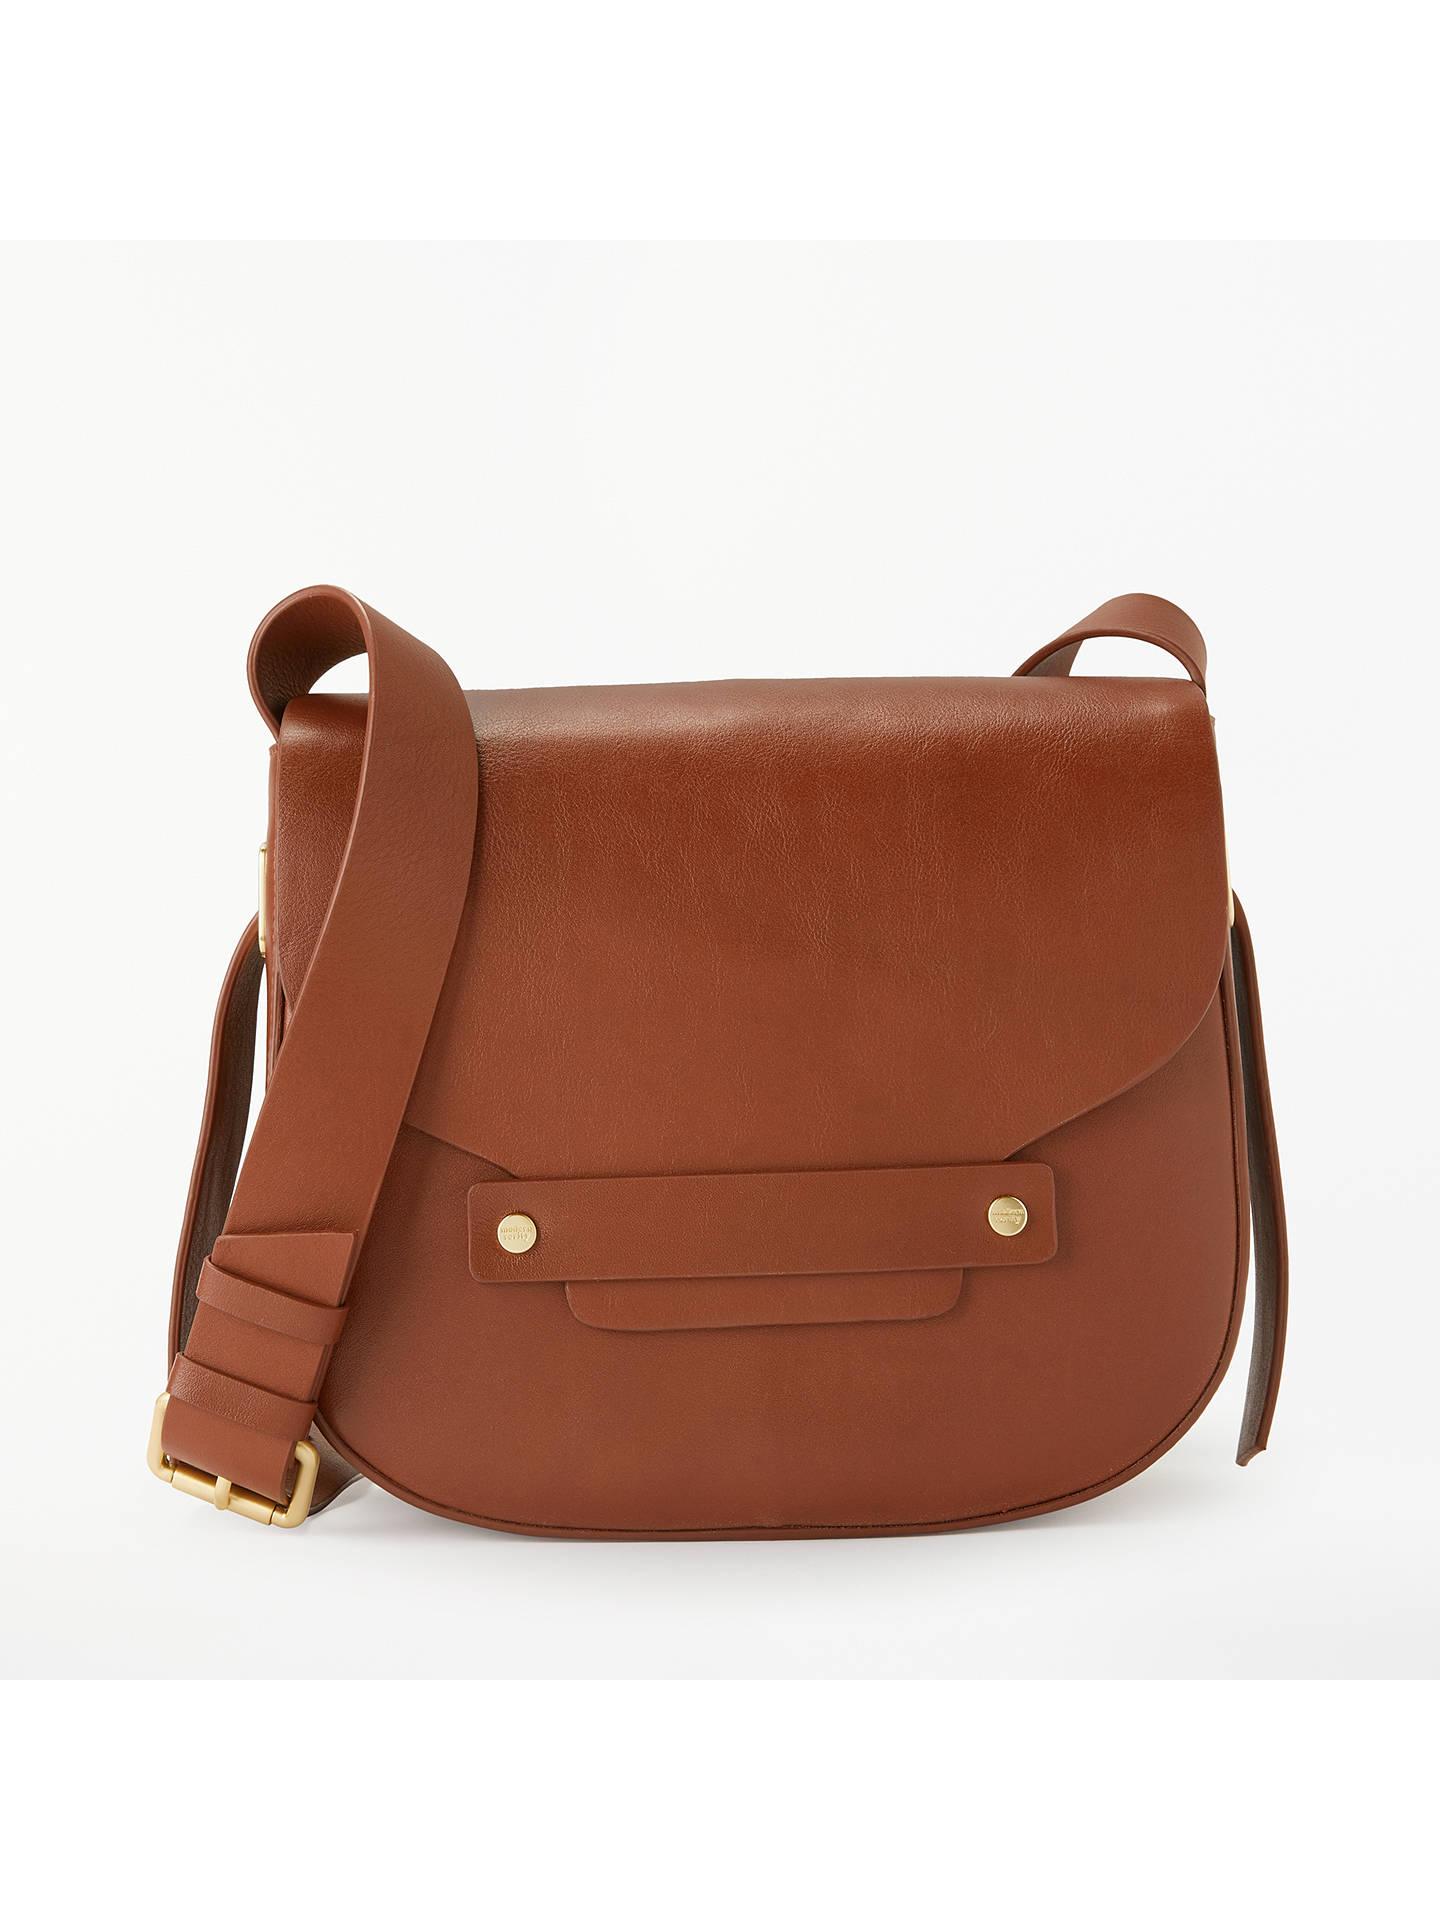 18a105396e7f Modern Rarity Ribbon Leather Saddle Bag, Tan